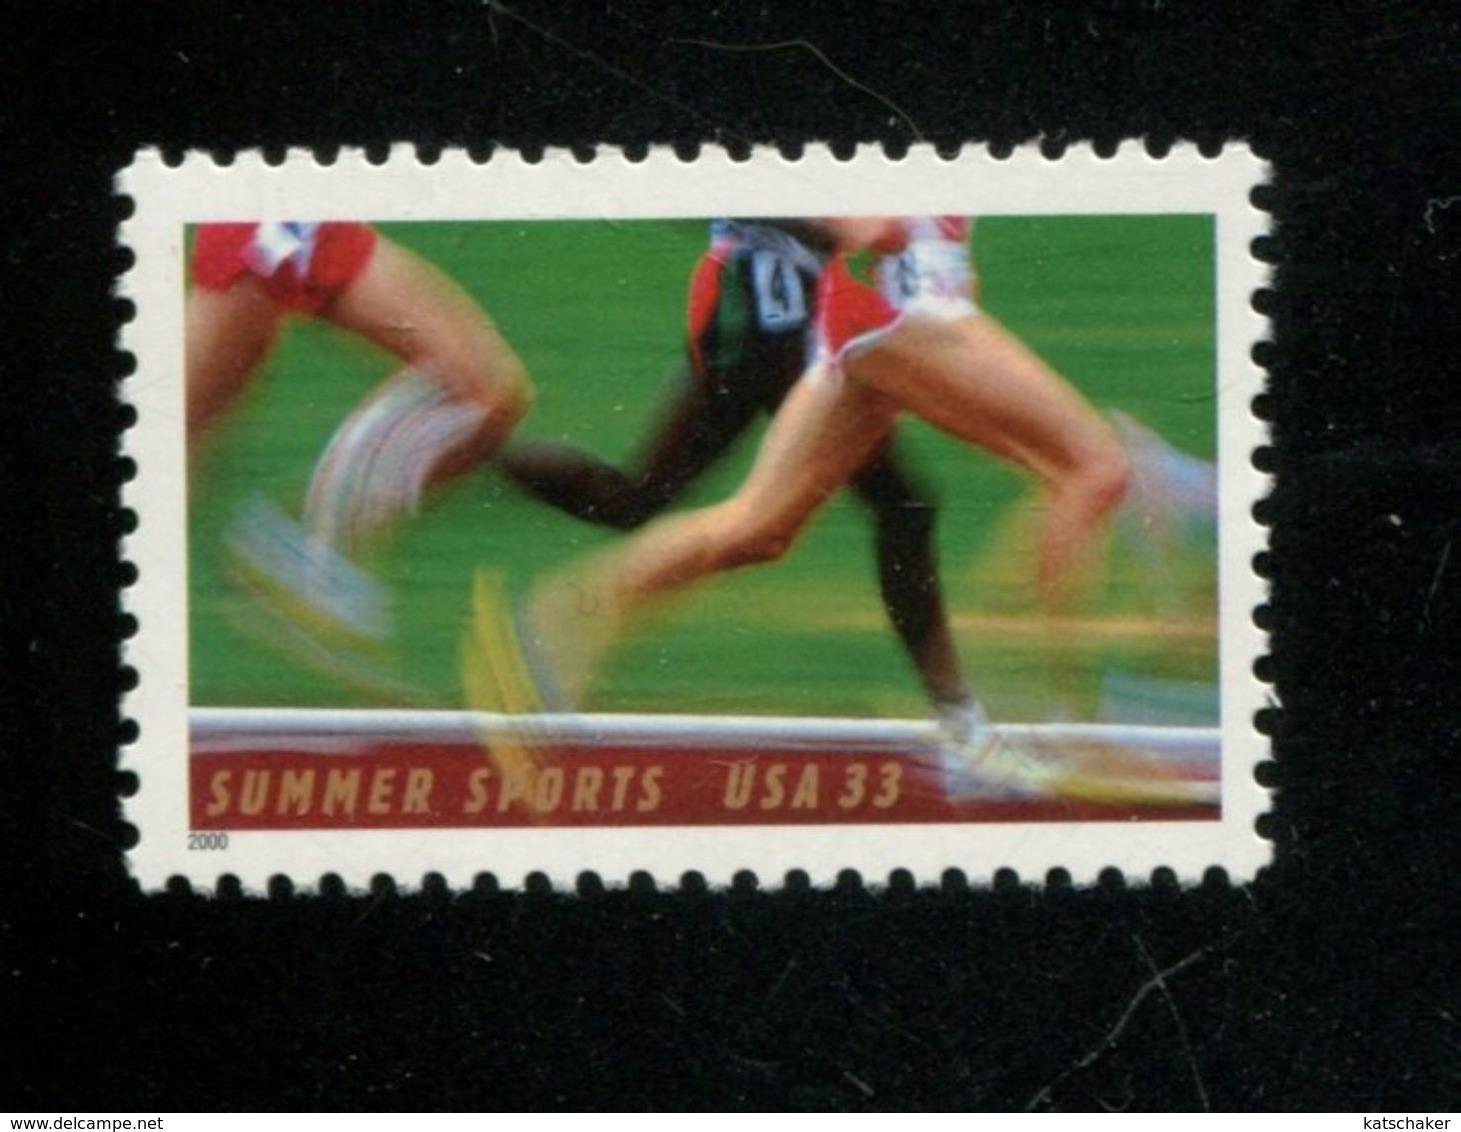 209517749 USA 2000 ** MNH SCOTT 3397 SUMMER SPORTS - Unused Stamps